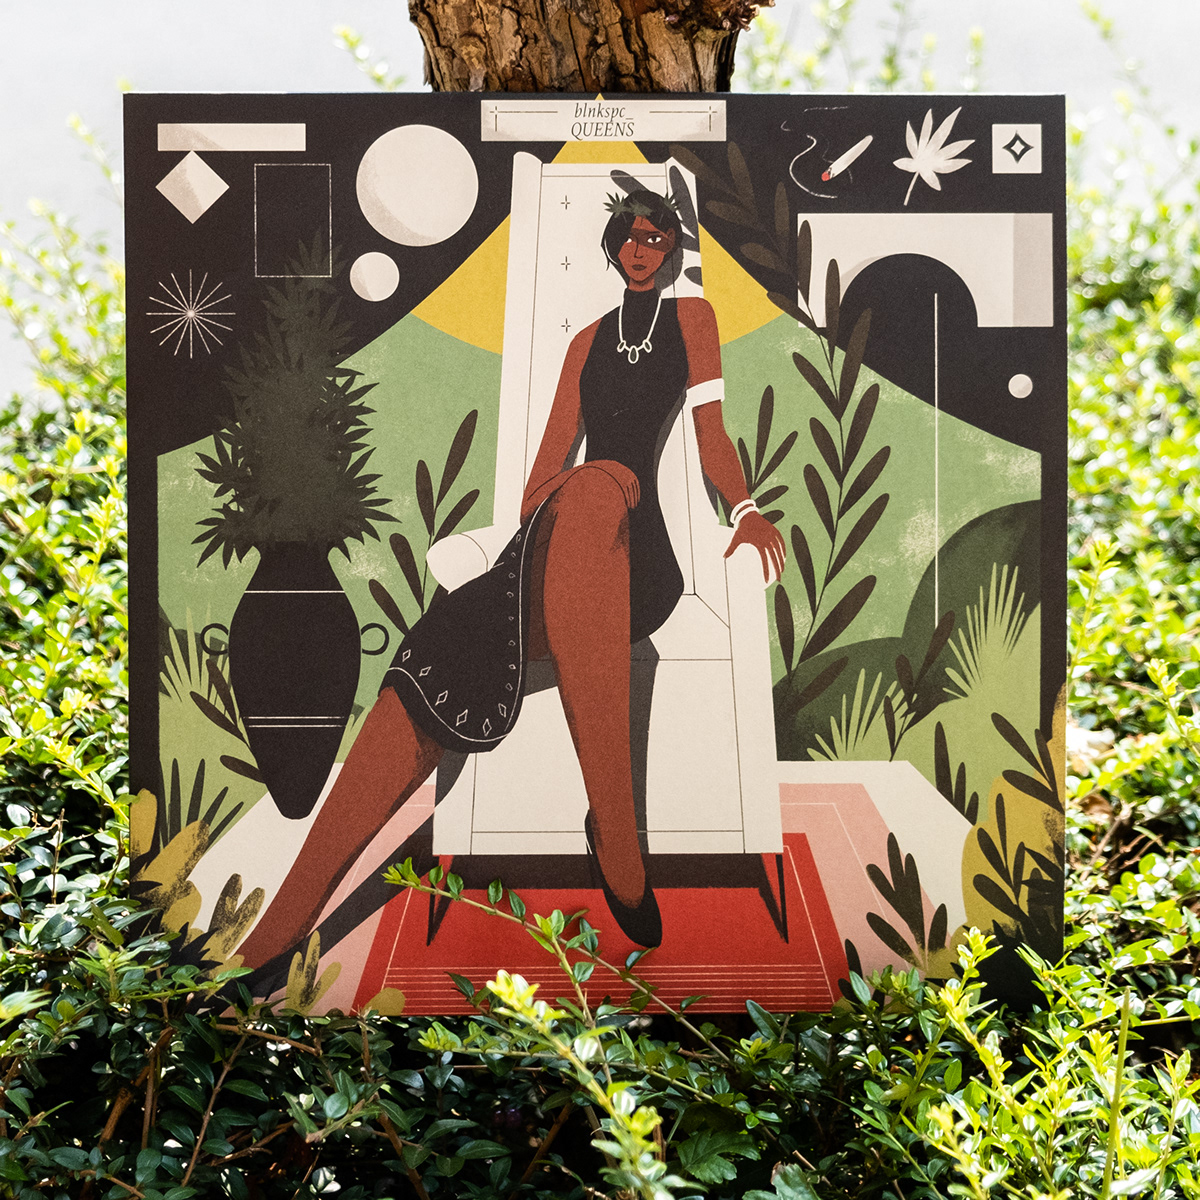 album cover artwork Digital Art  environment figure graphic design  plants queen shapes texture